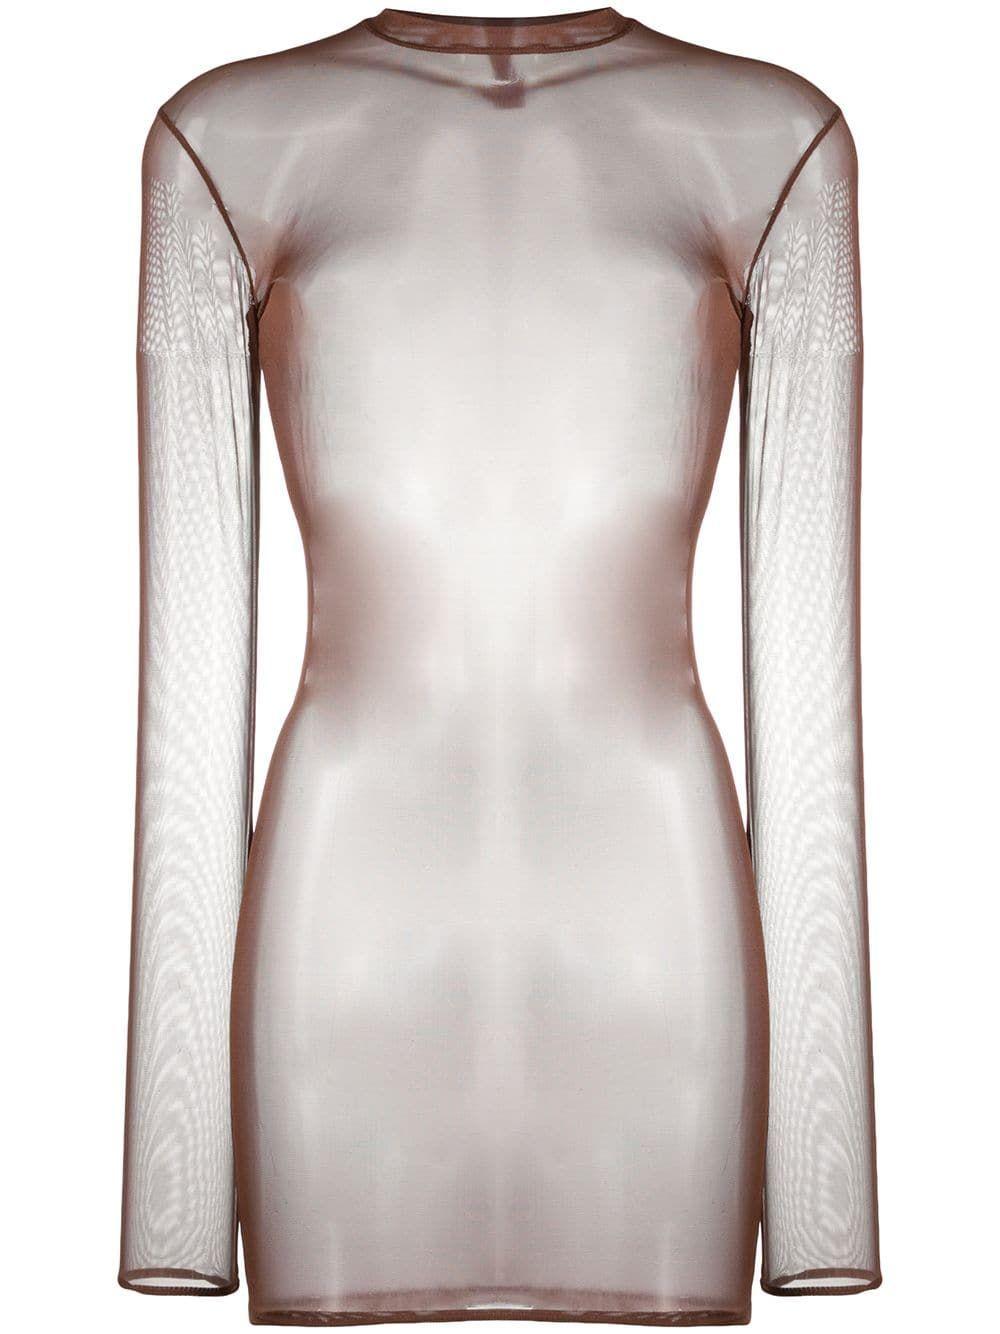 Maison Close Sheer Mesh Mini Dress Farfetch In 2021 Mini Dress Long Sleeve And Shorts Dresses [ 1334 x 1000 Pixel ]